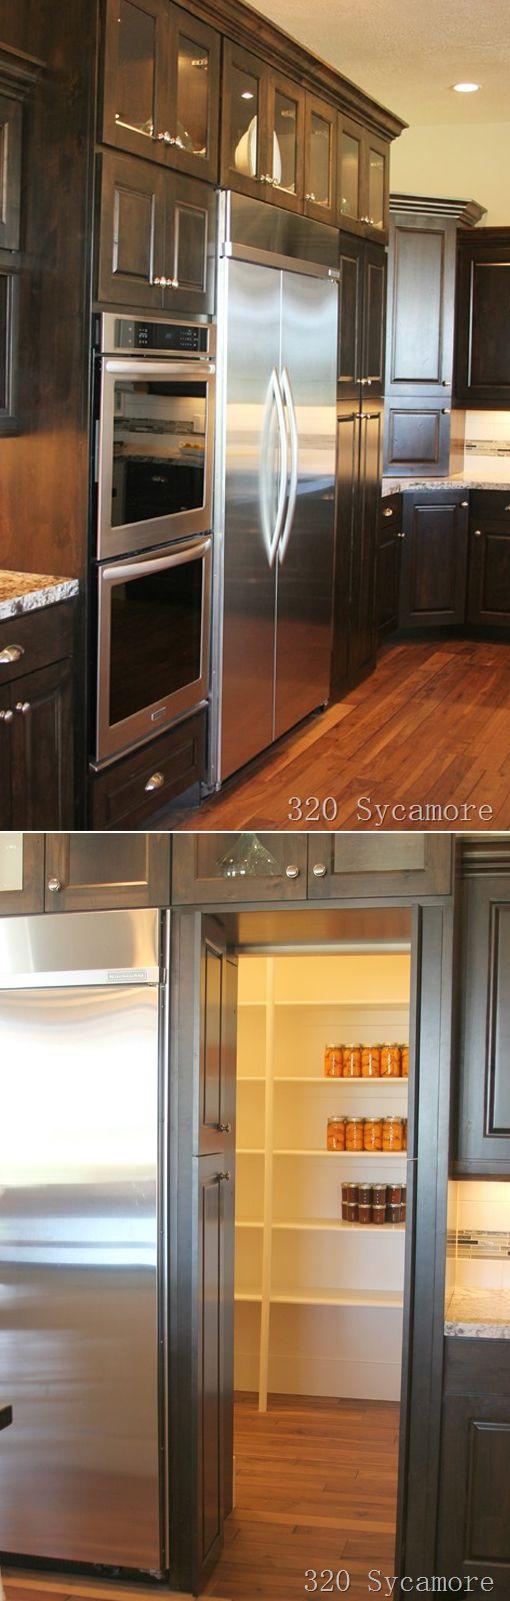 Double Oven Kitchen Design 10 Best Ideas About Double Ovens On Pinterest Double Oven